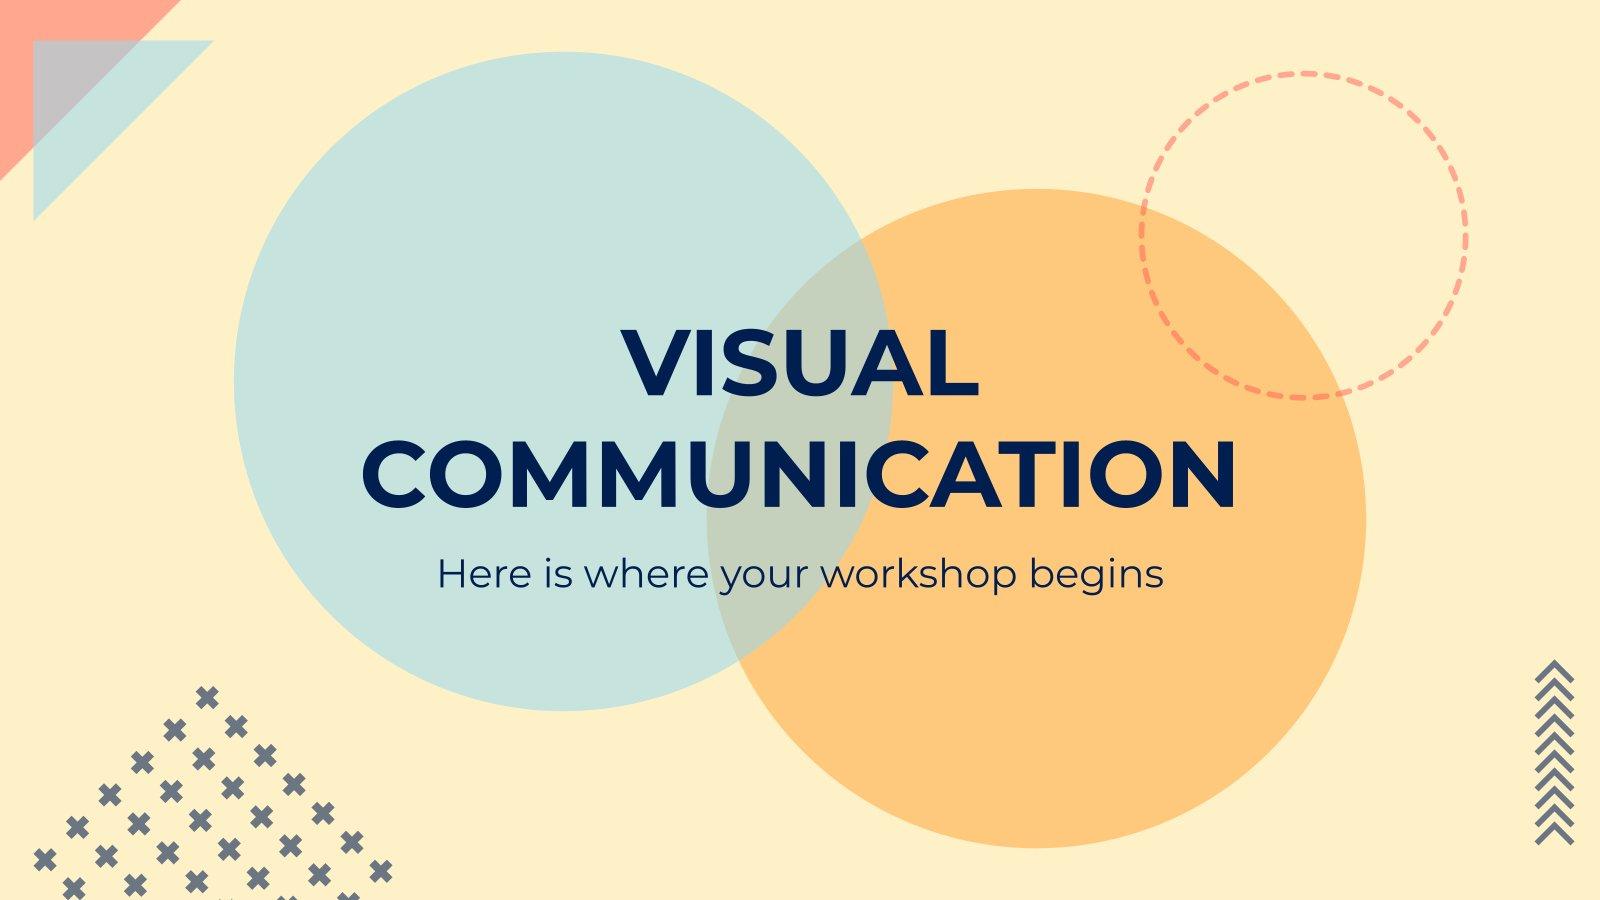 Visual Communication Workshop presentation template